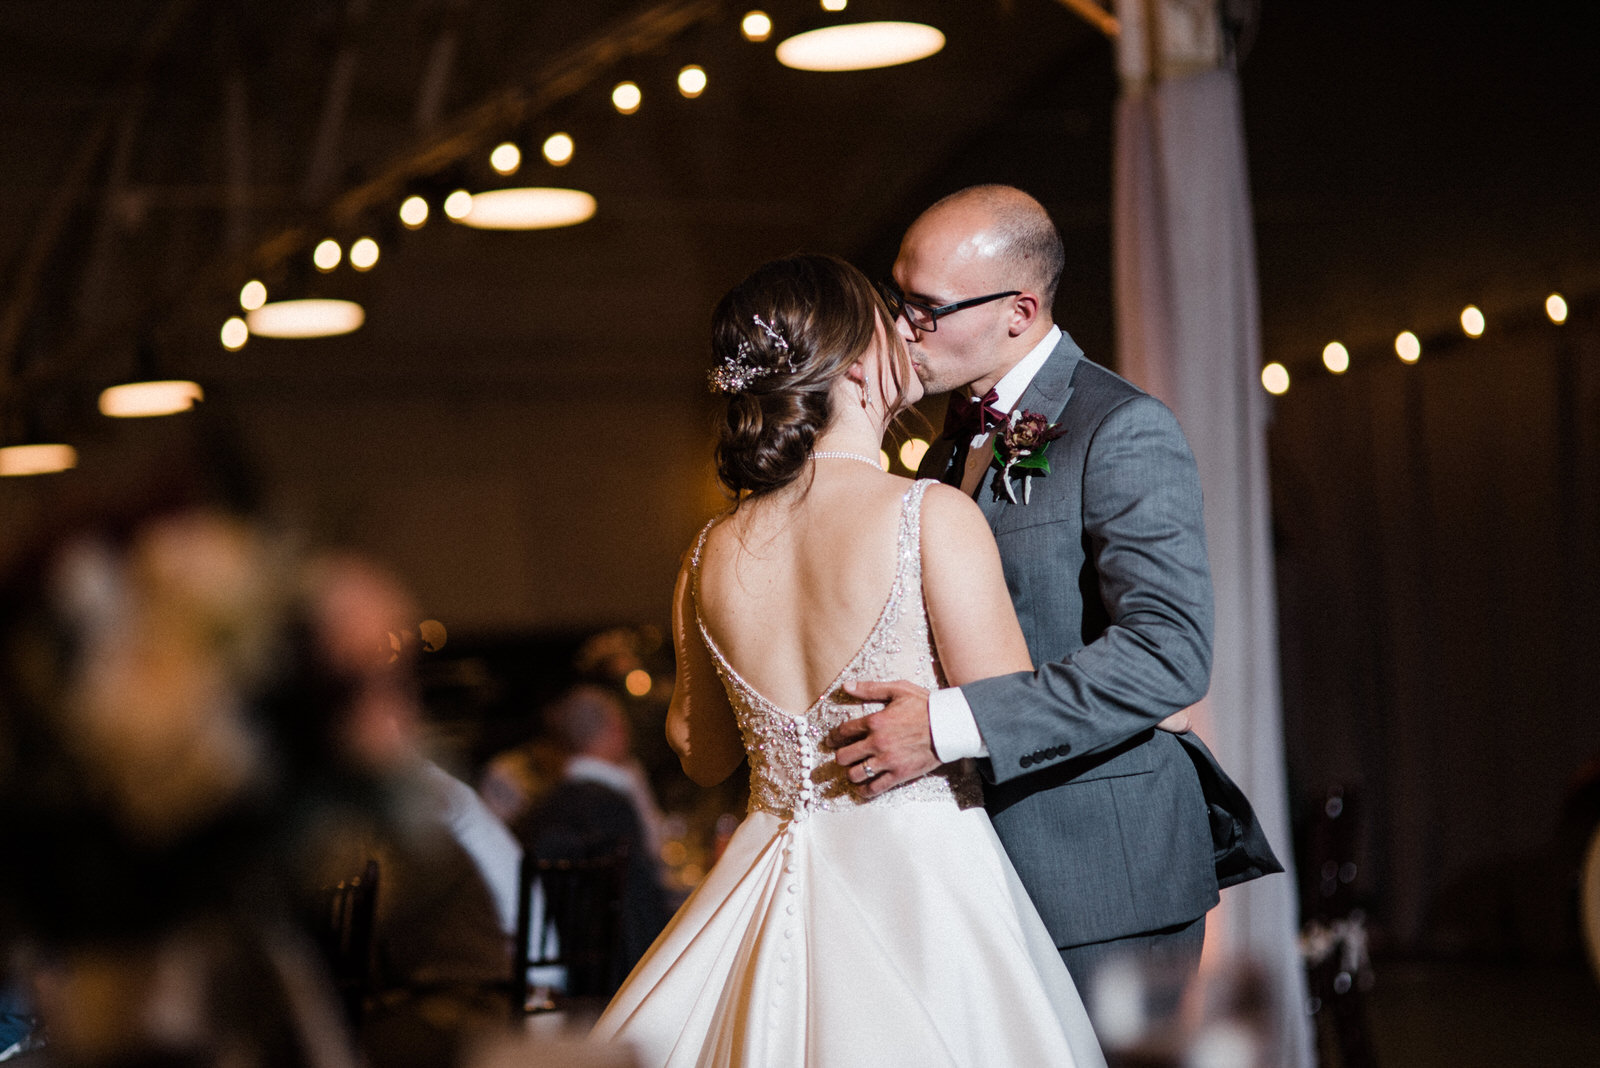 First dance at Americas Packard Museum wedding reception